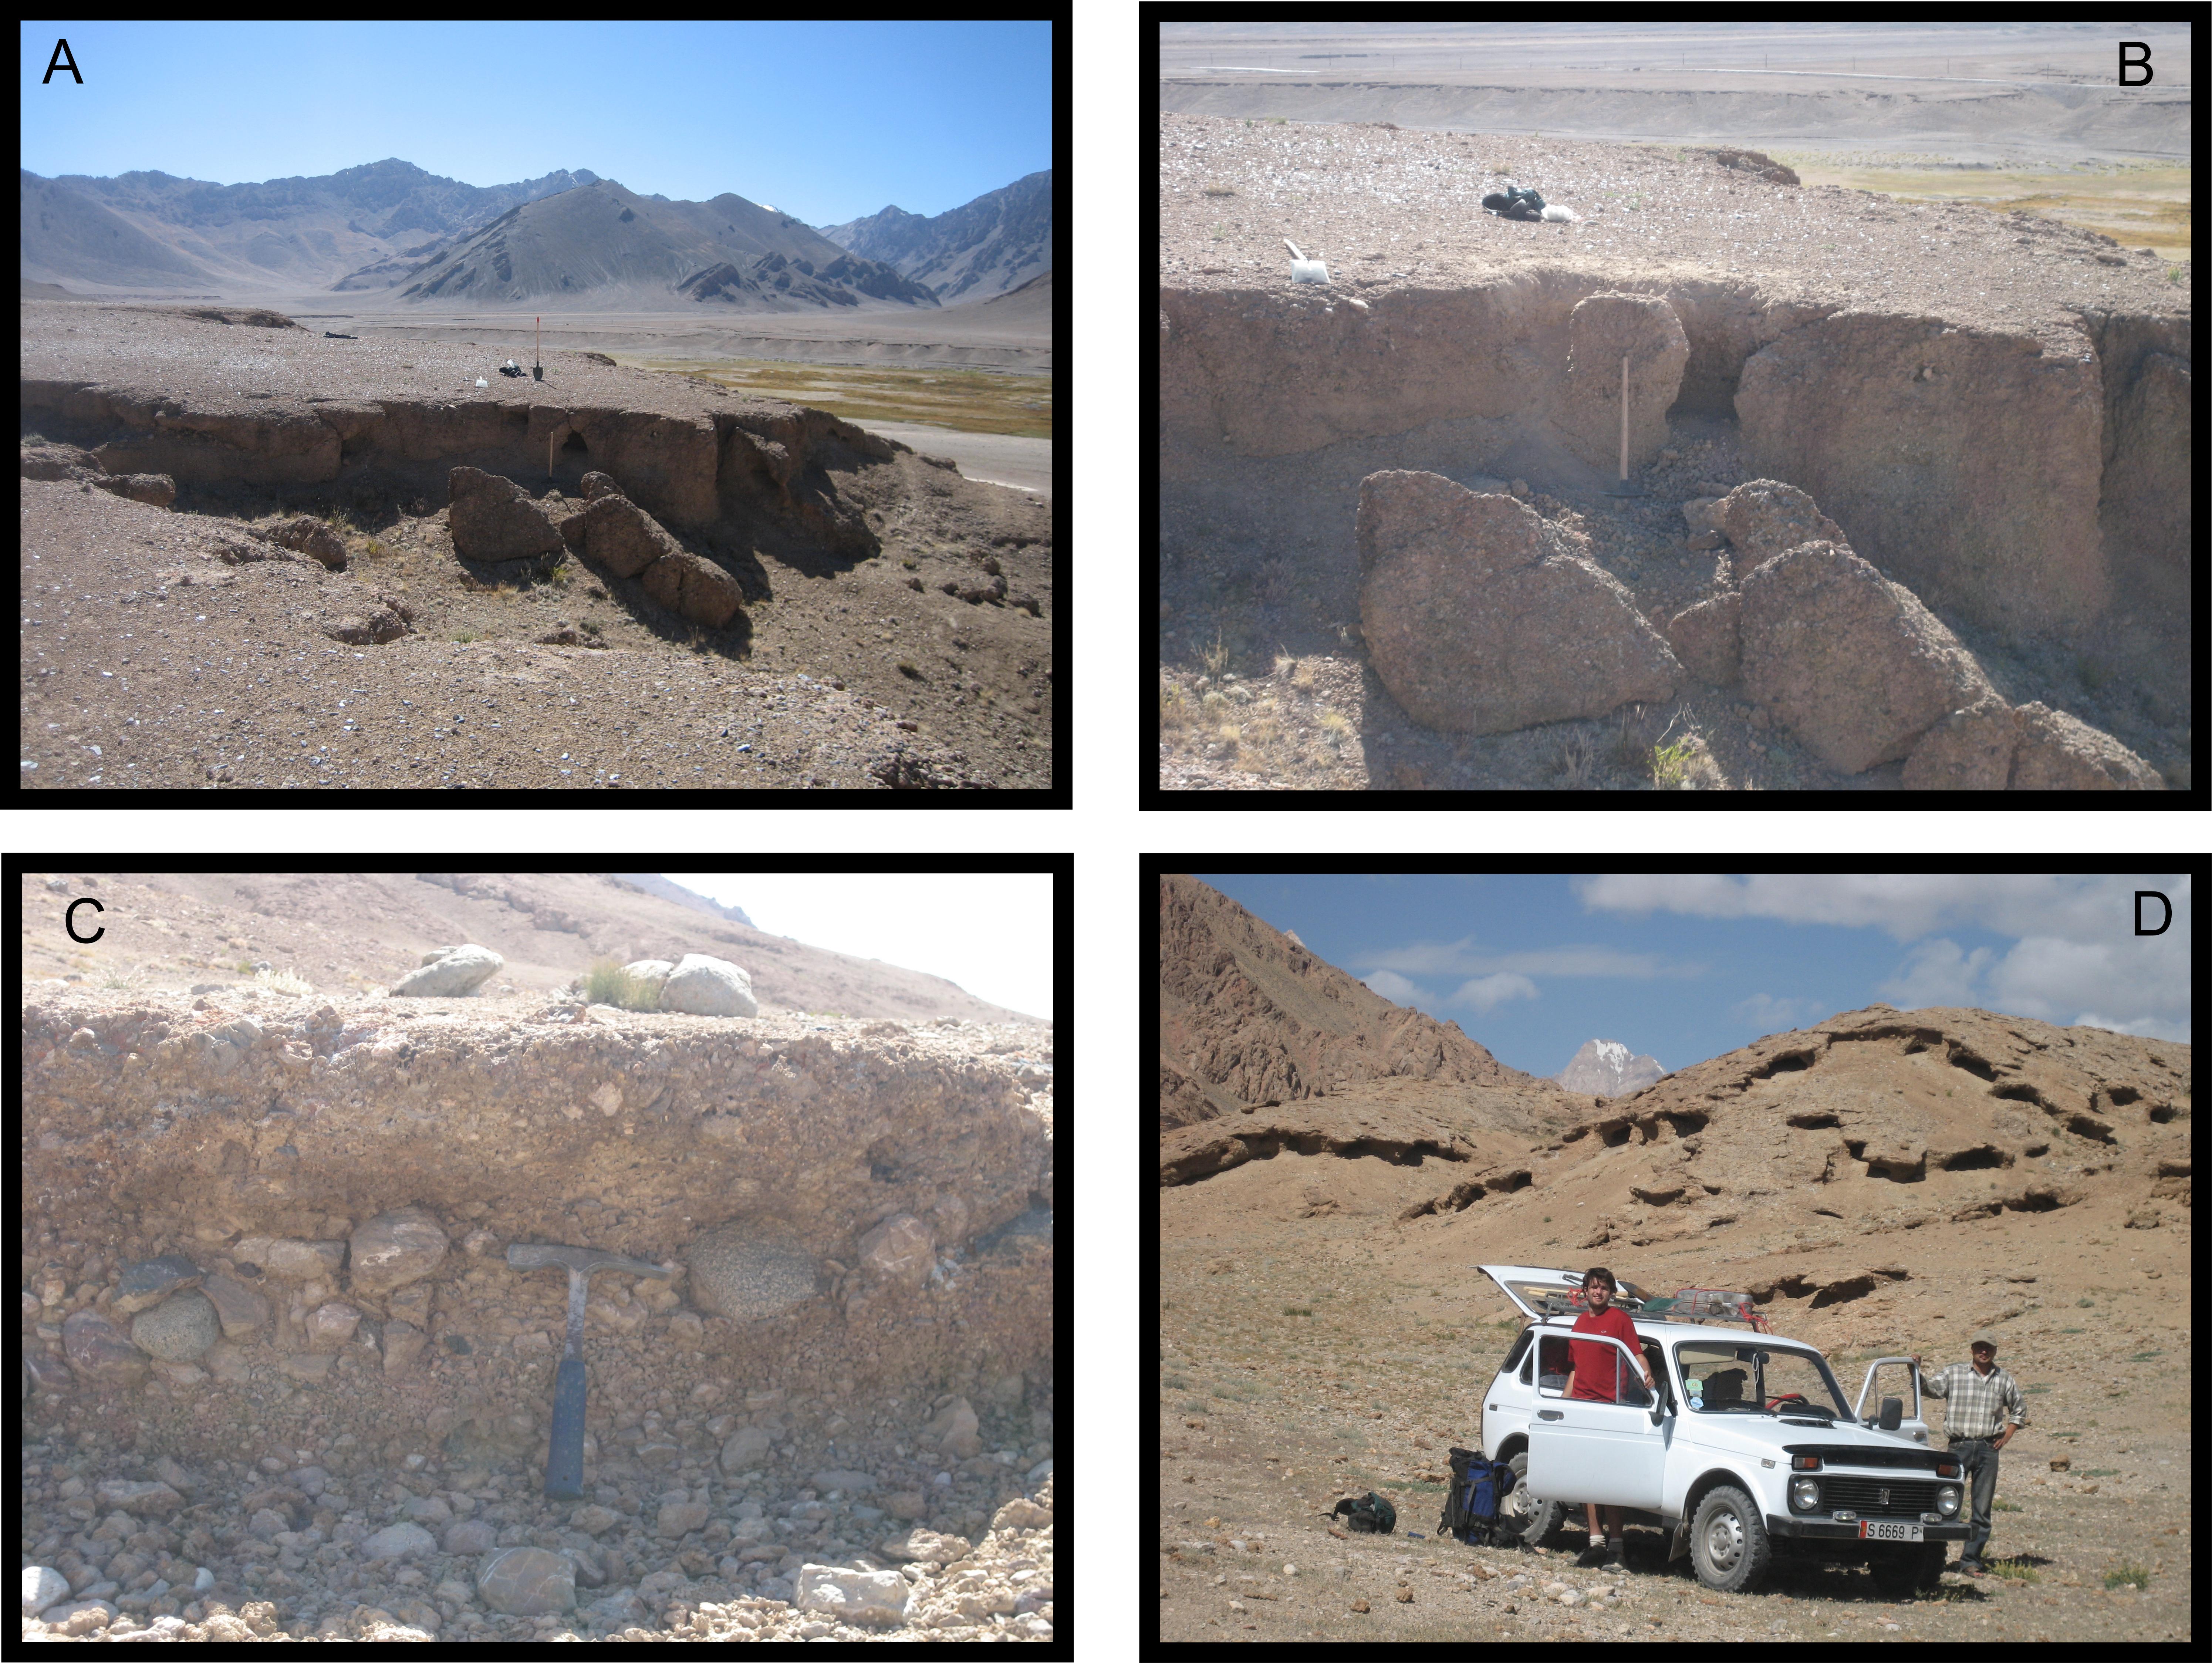 Carbonate cemented landforms of the pamir plateau for Terrace landform